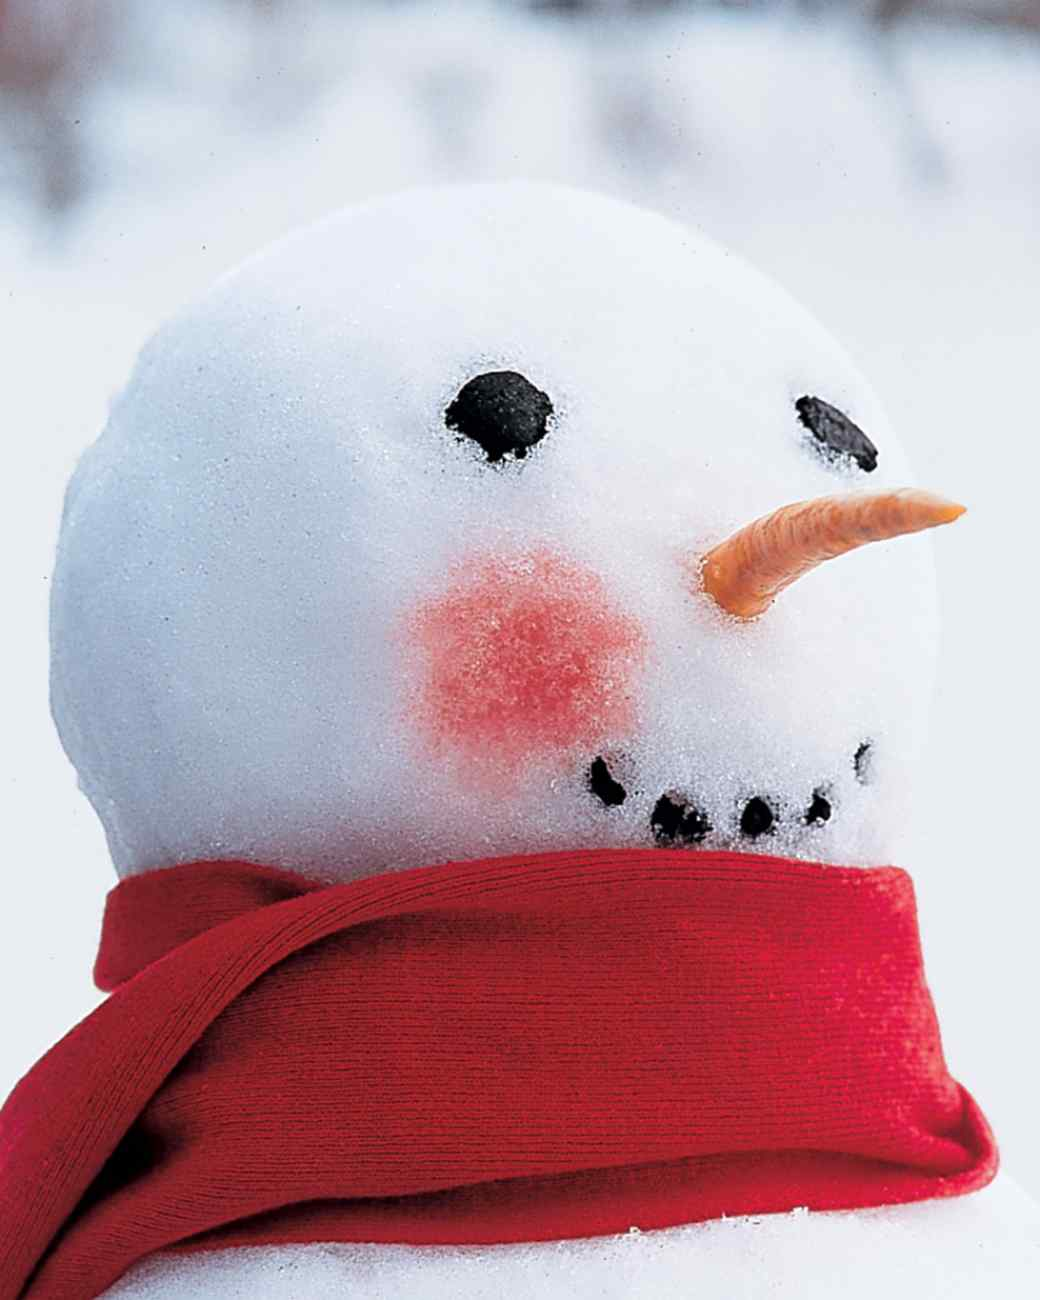 Rosy cheeked snowman